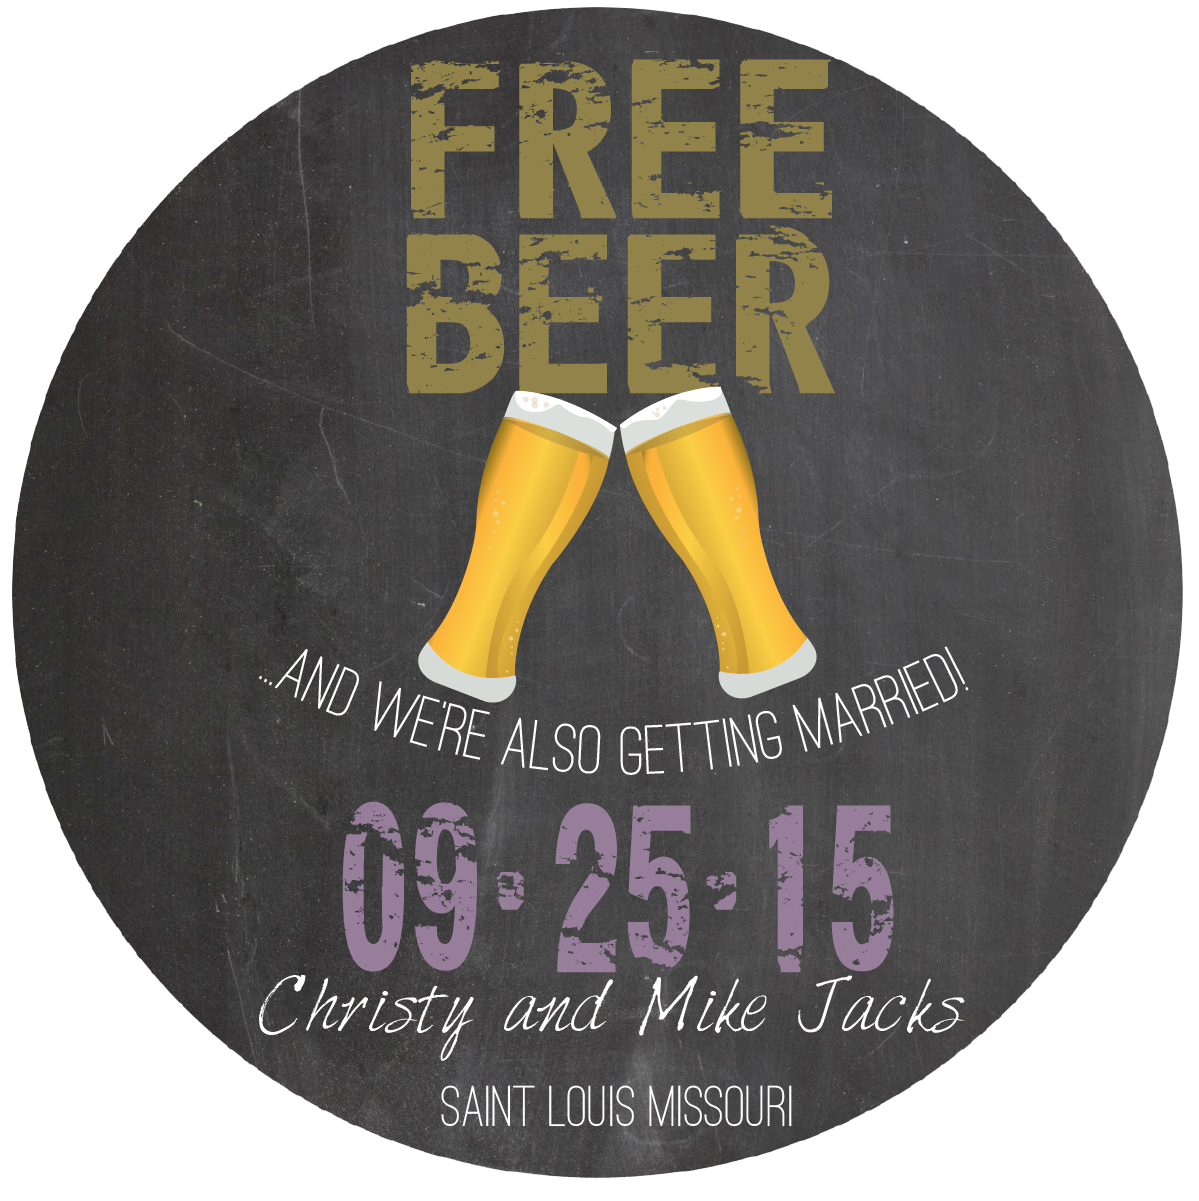 save the date design vintage free beer fliptstl graphics